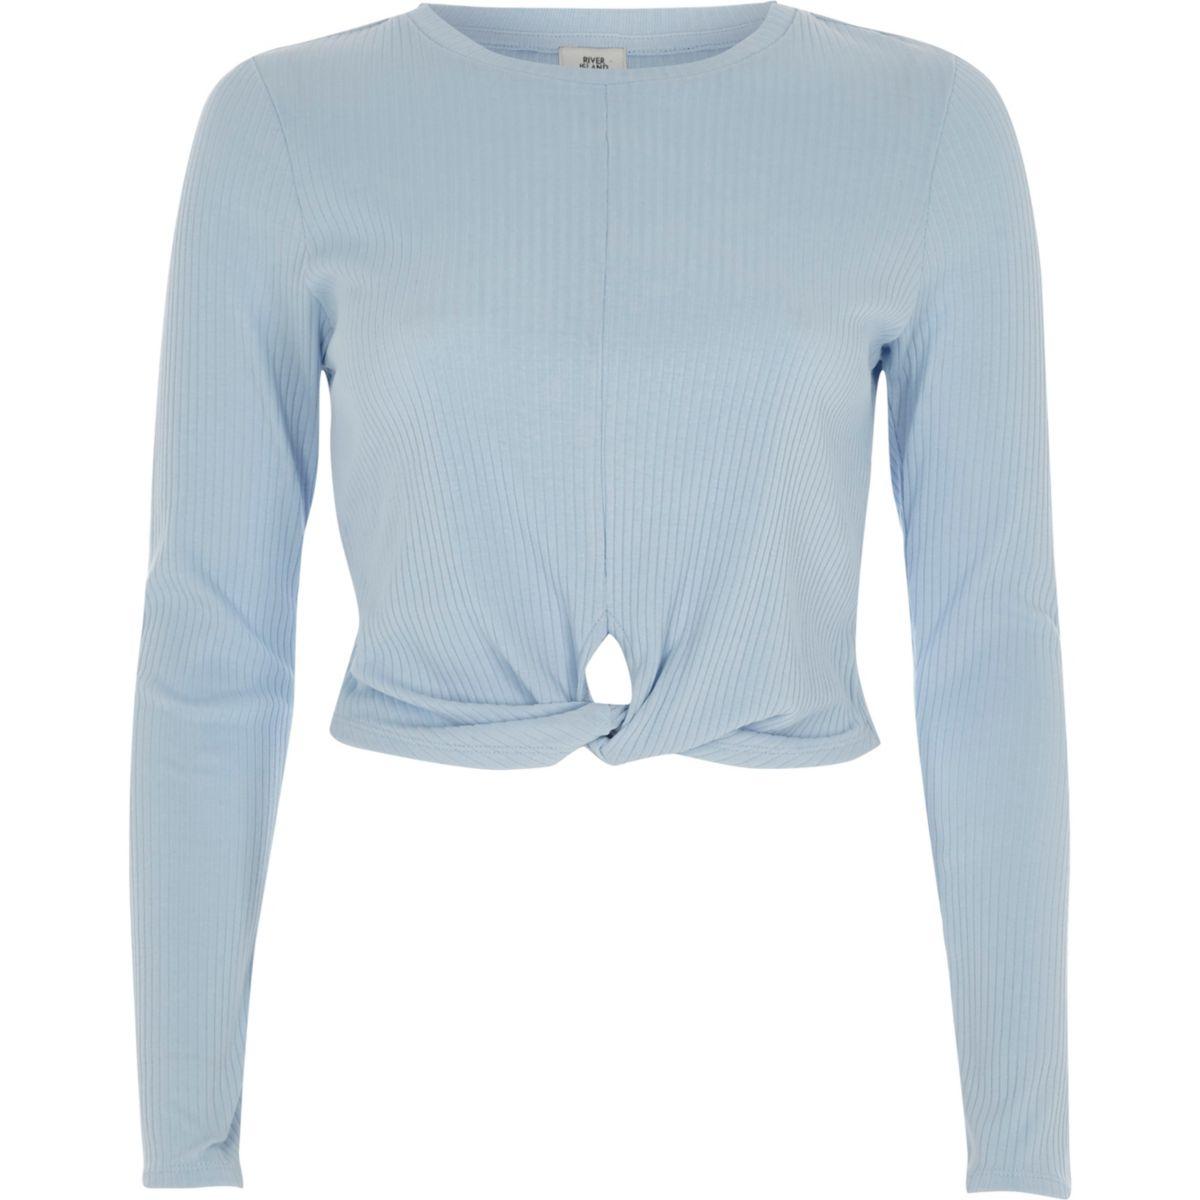 Light blue twist front long sleeve crop top